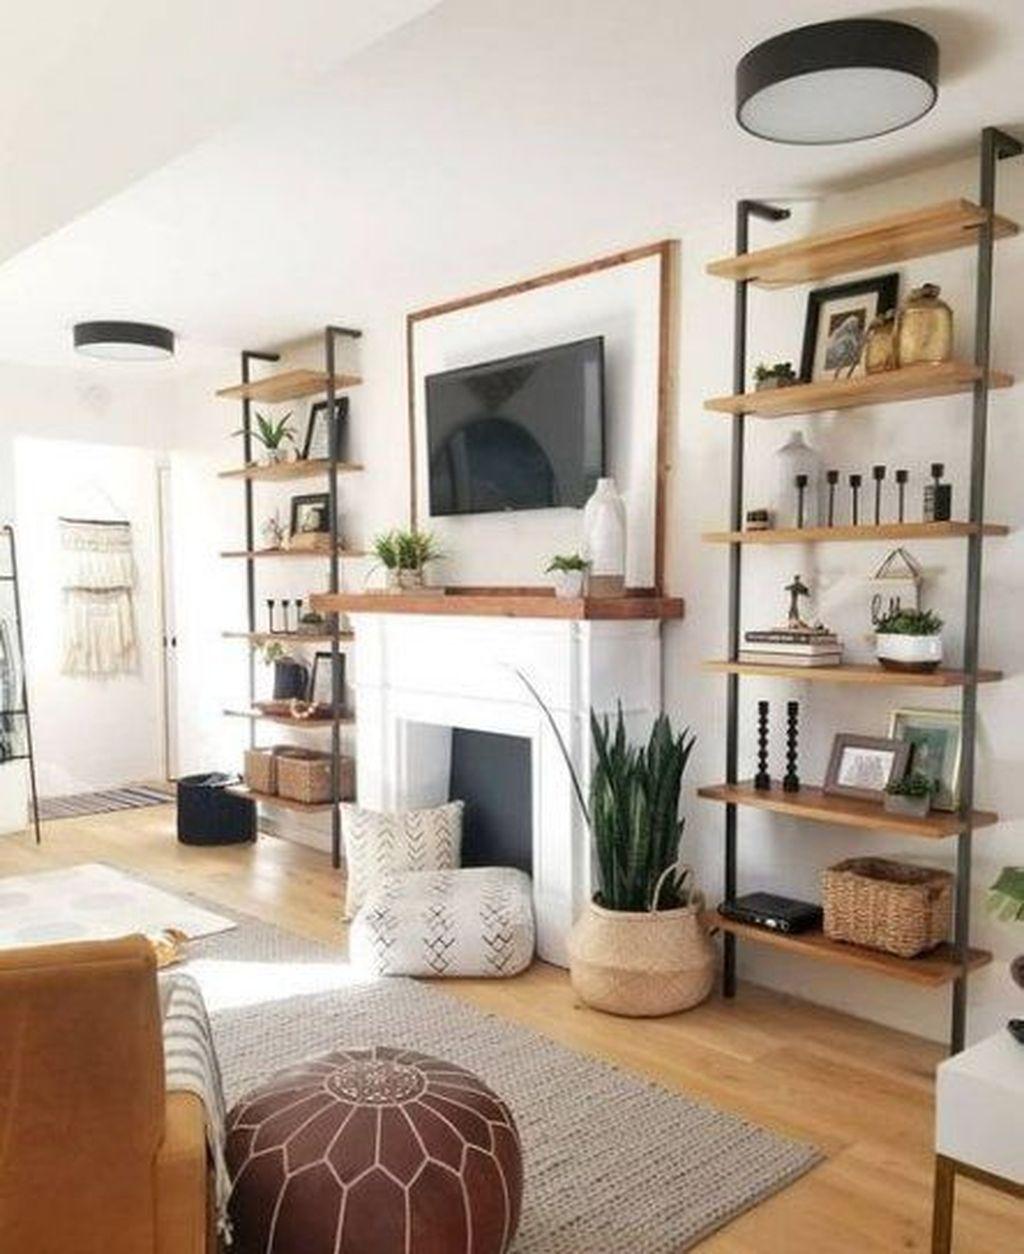 Stunning Farmhouse Interior Design Ideas To Realize Your Dreams 19